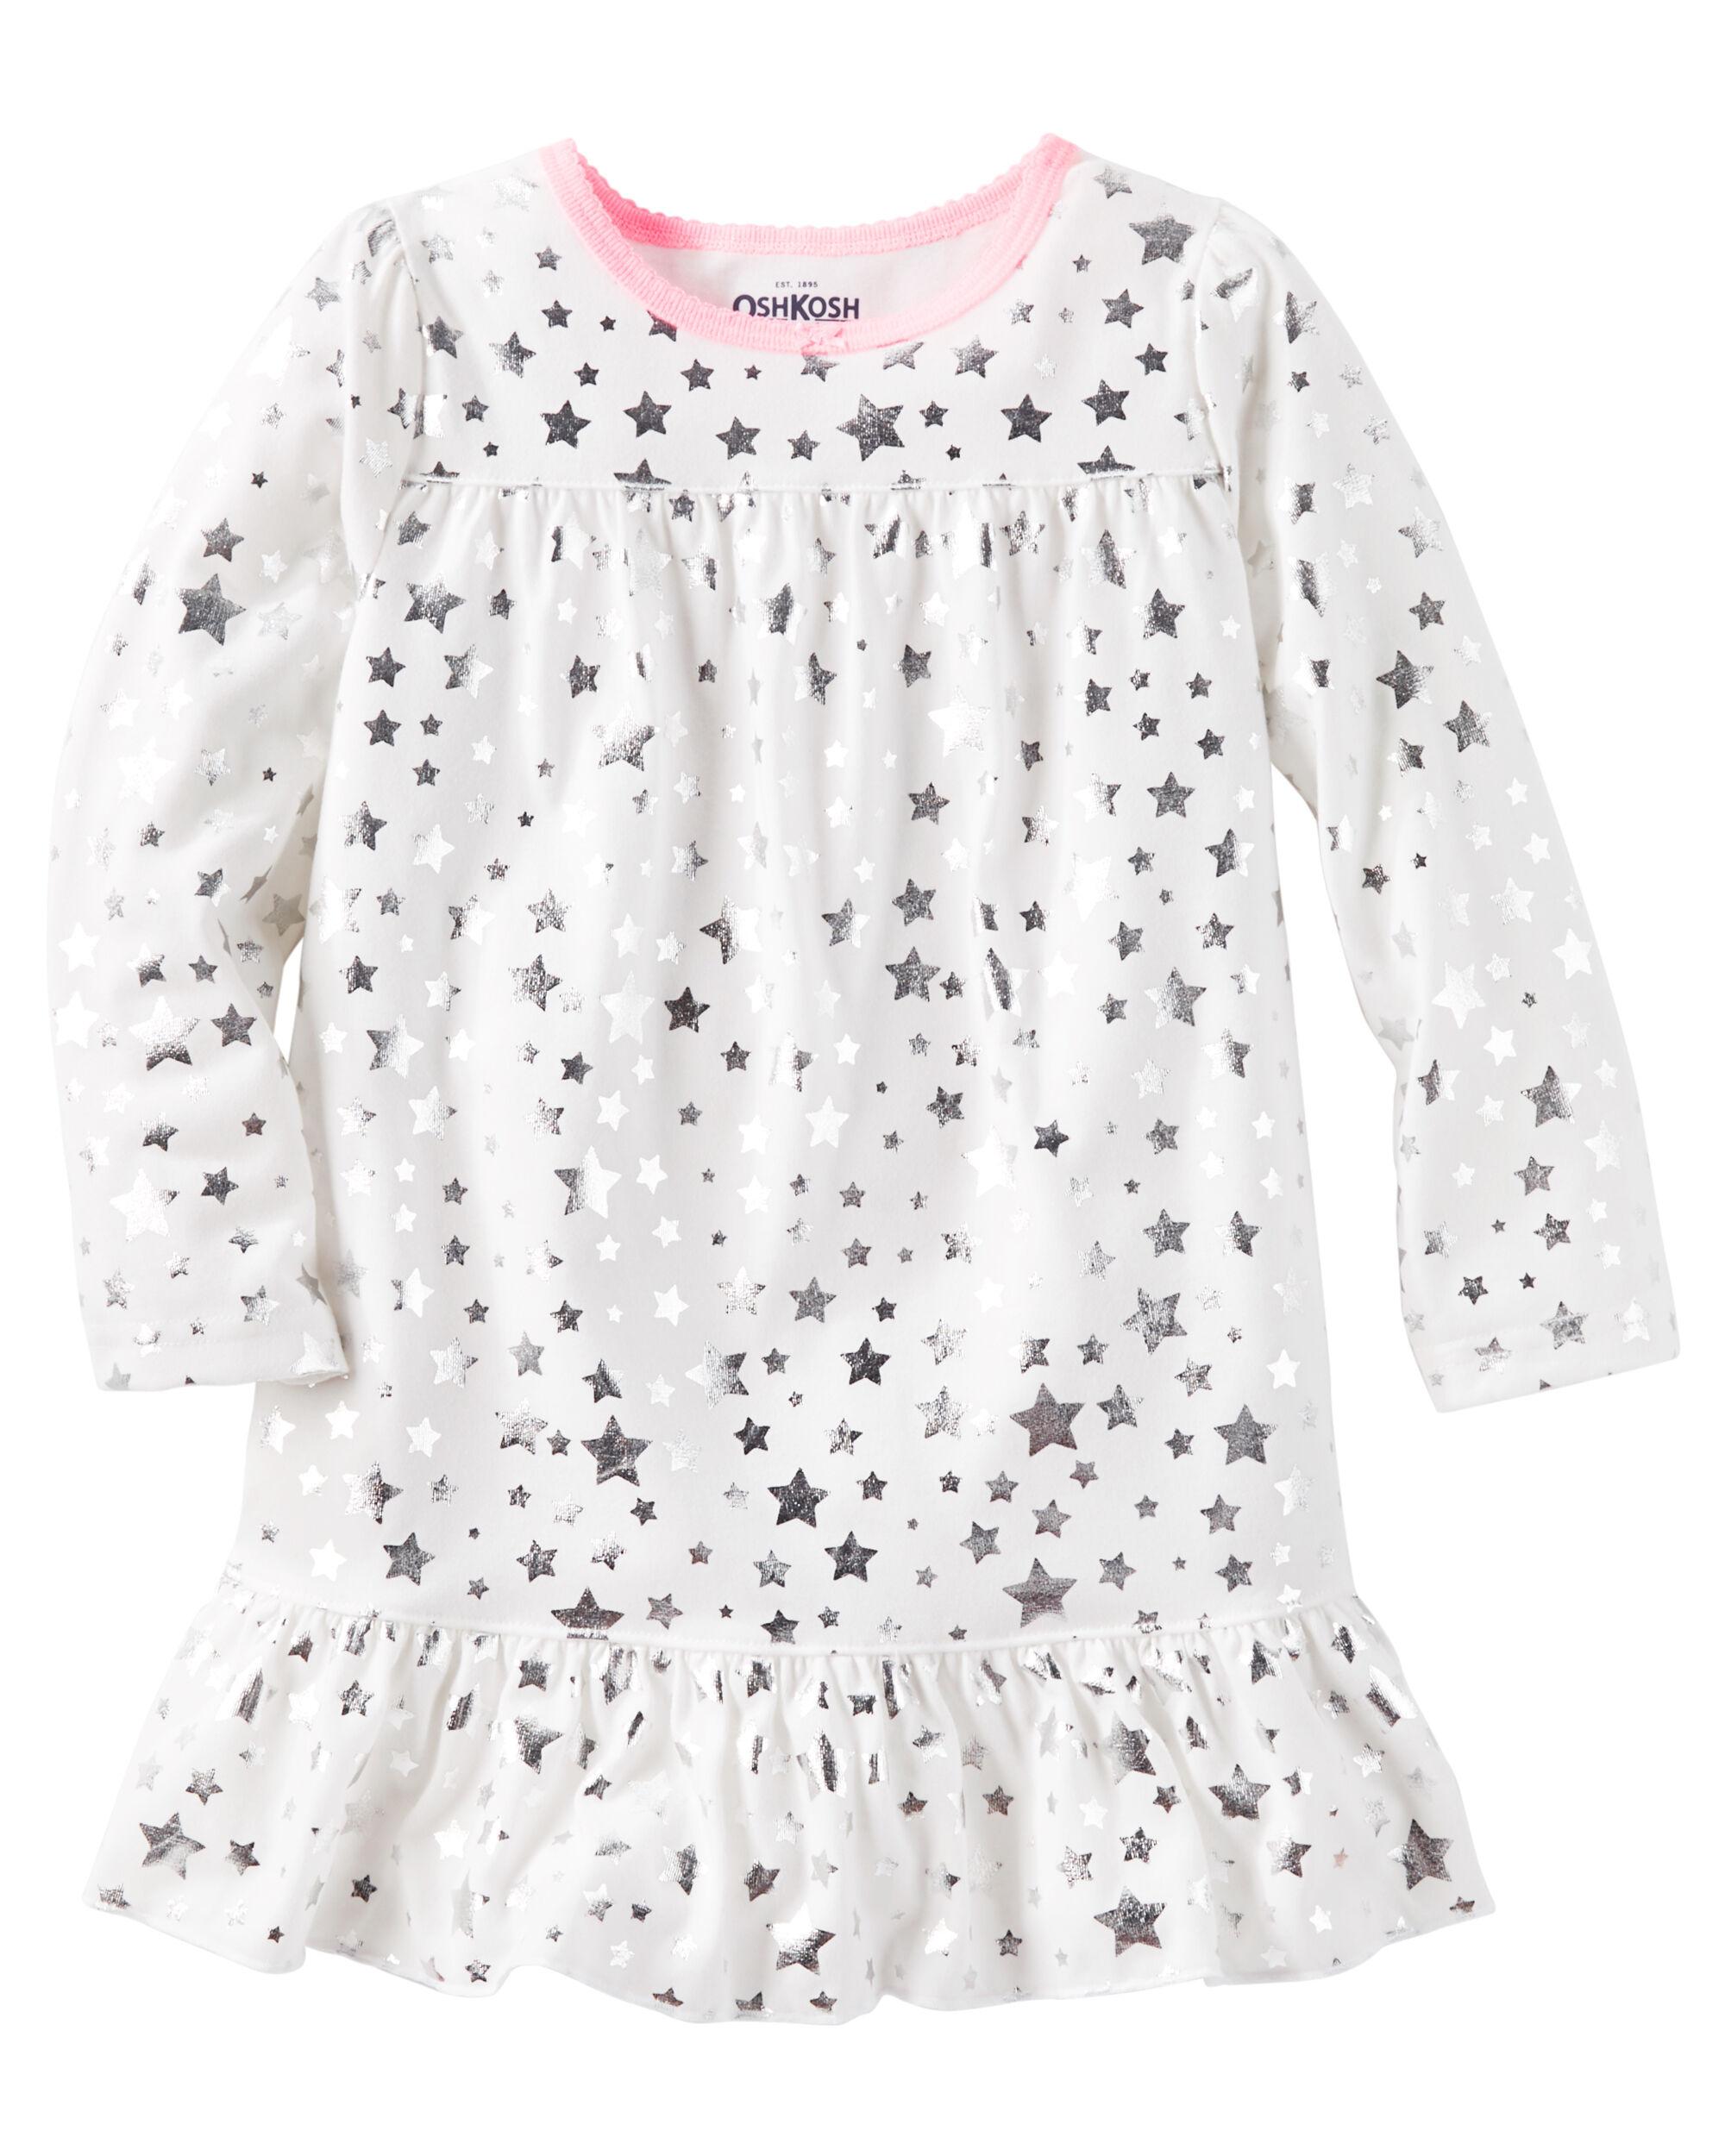 Sparkle Star Sleep Gown   OshKosh.com